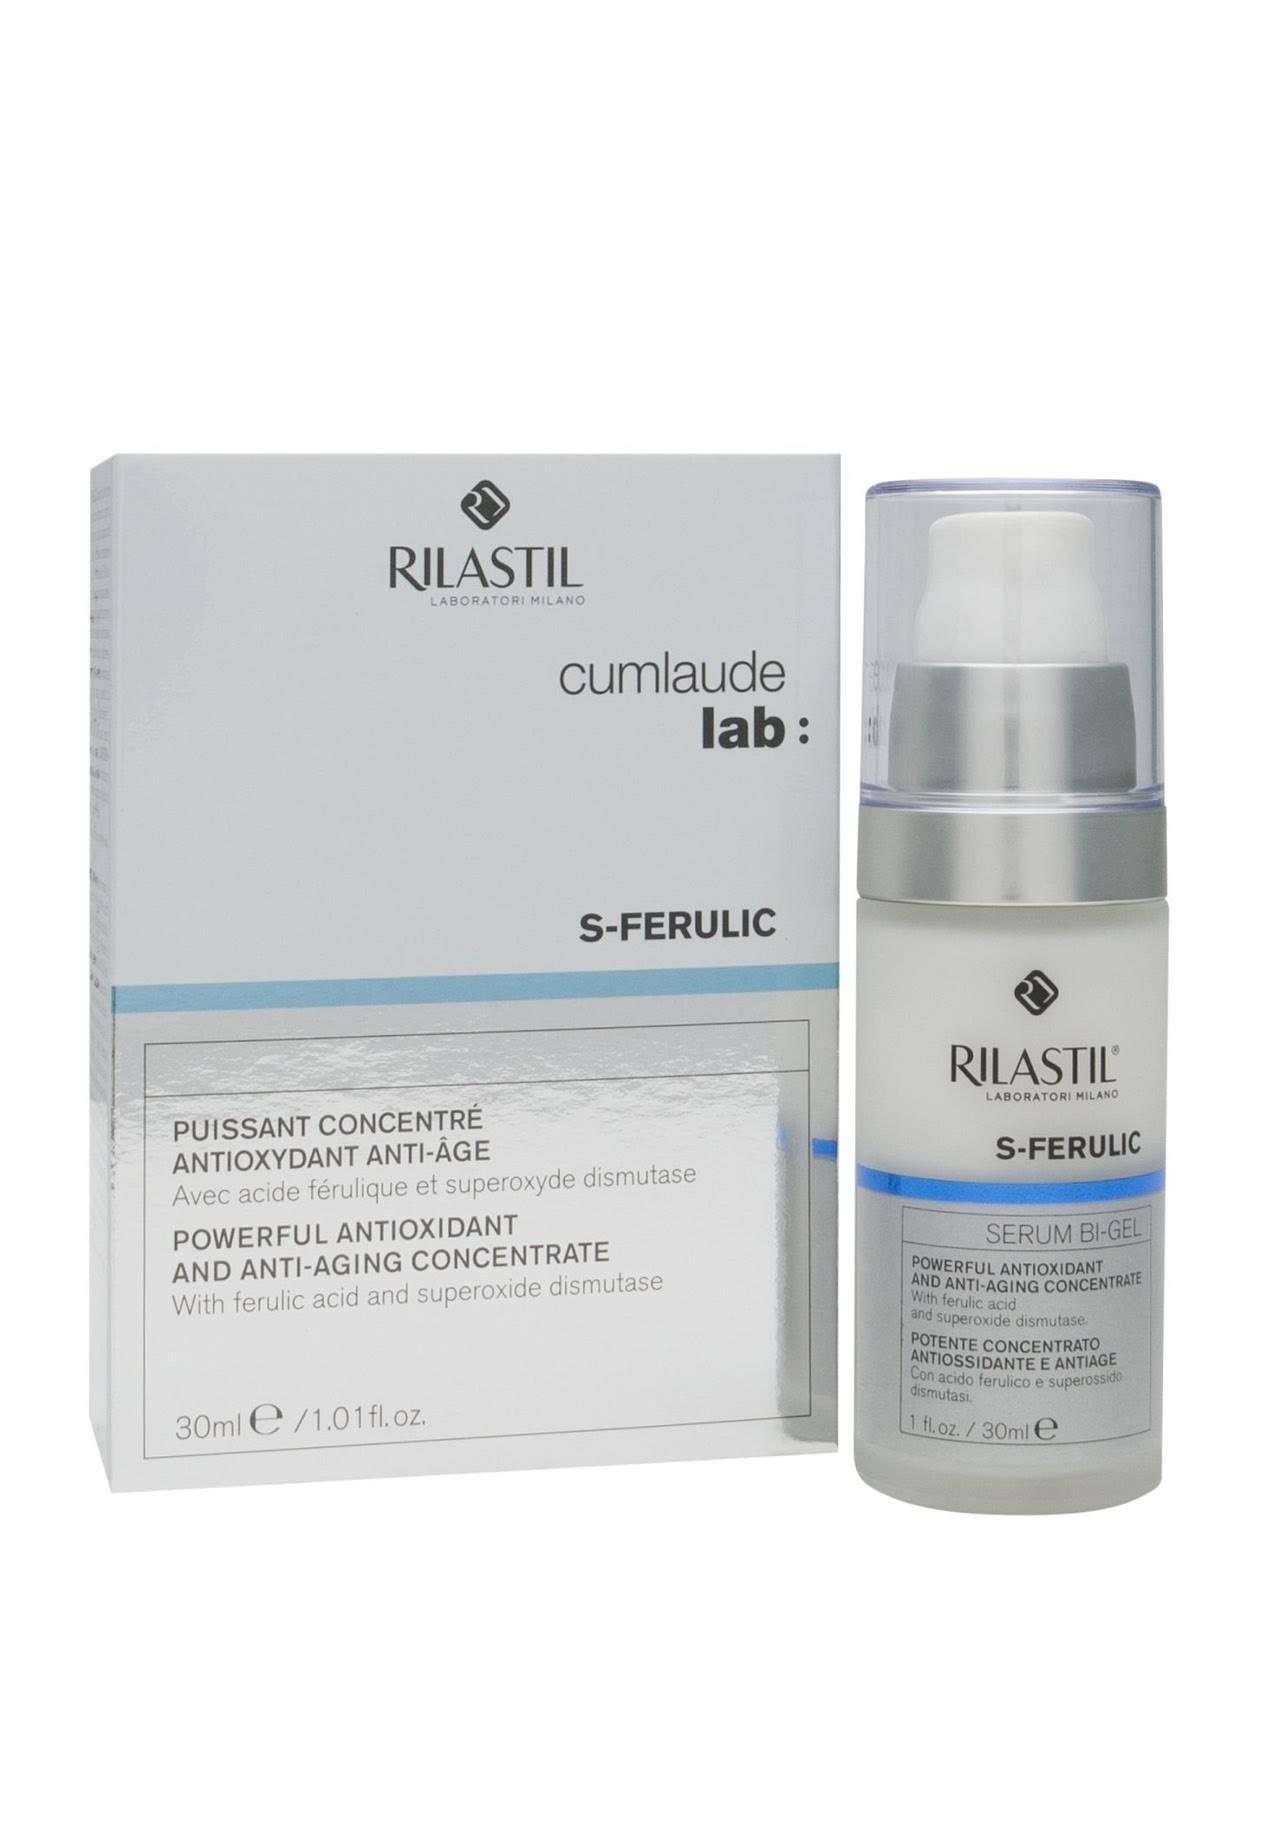 Cosmetics Superoxide Dismutase concentrate Rilastil S-Ferulic from Cumlaude Lab